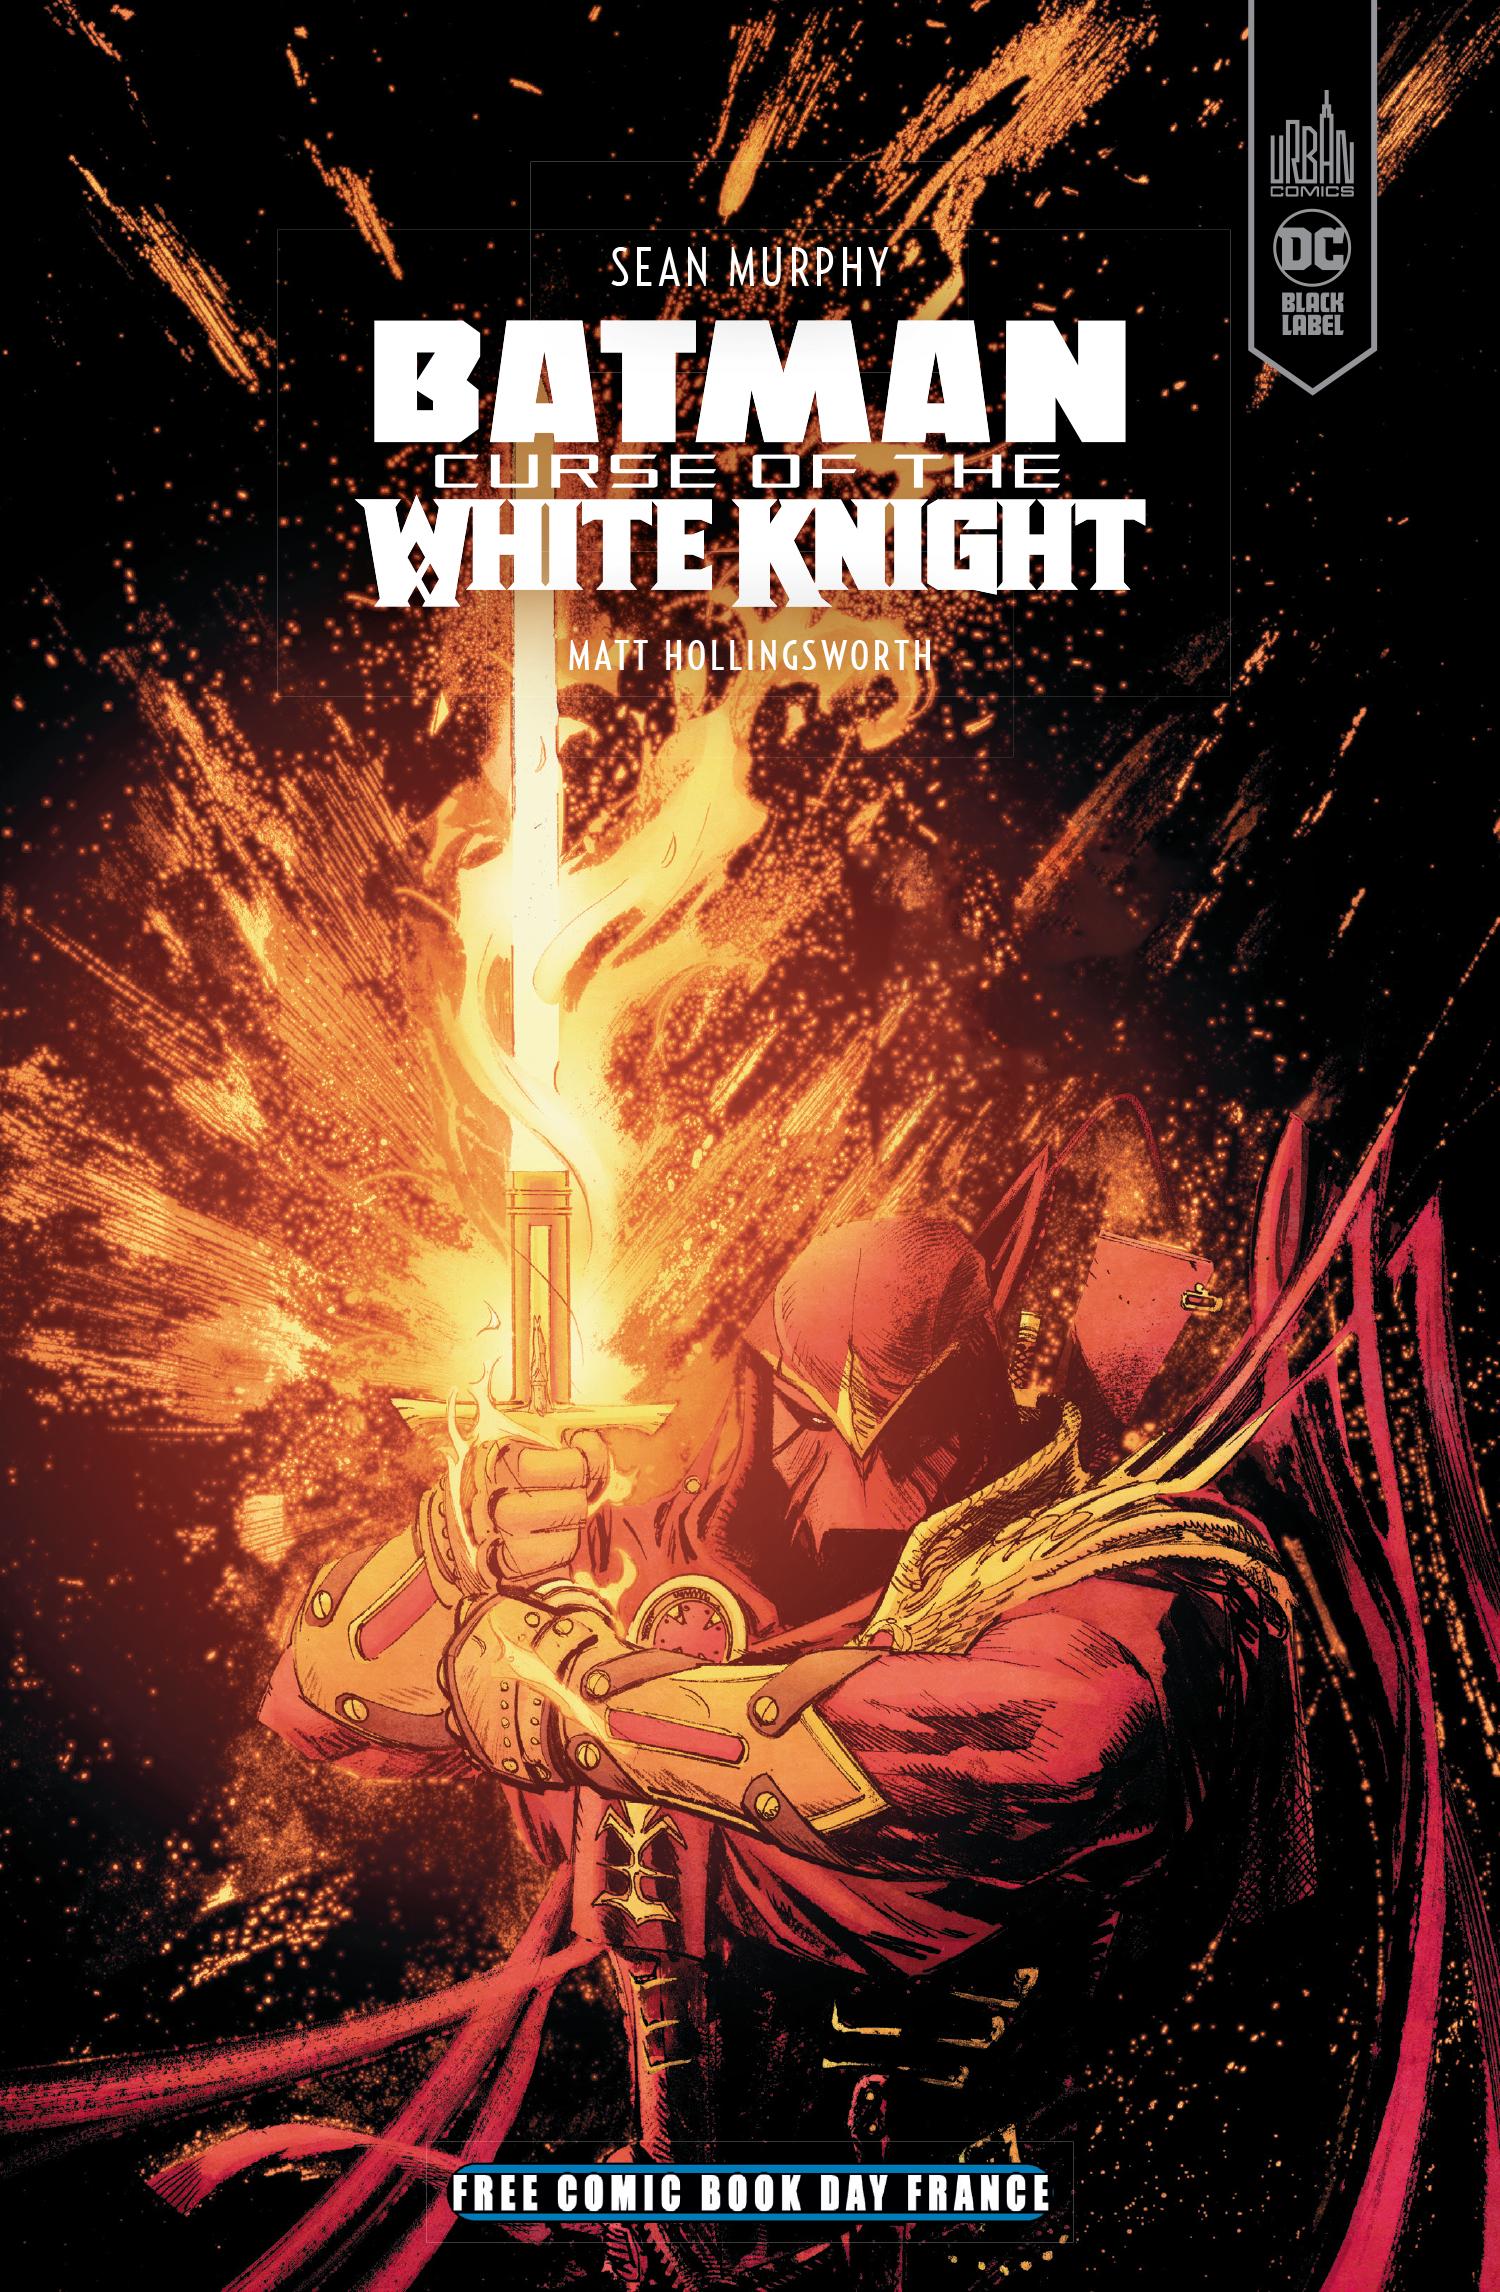 FCBD2020 - Batman : Curse Of The White Knight